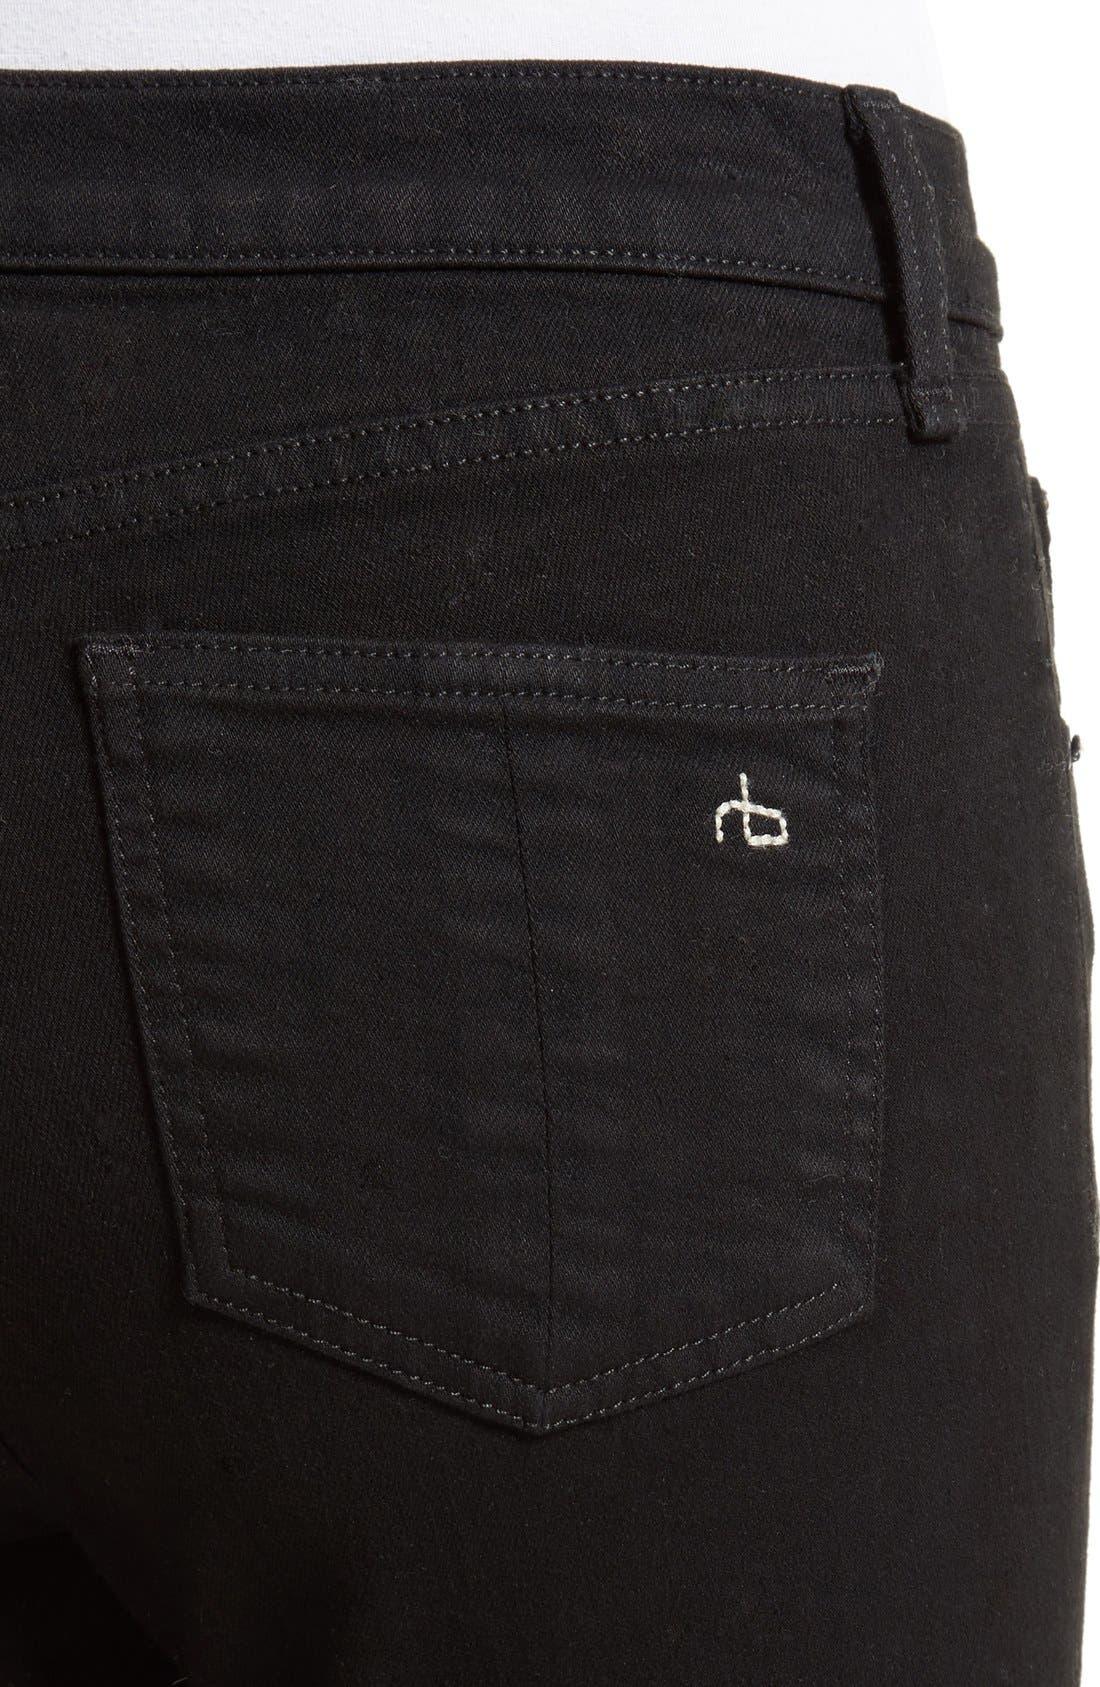 Cutoff Capri Jeans,                             Alternate thumbnail 4, color,                             Black Hampton